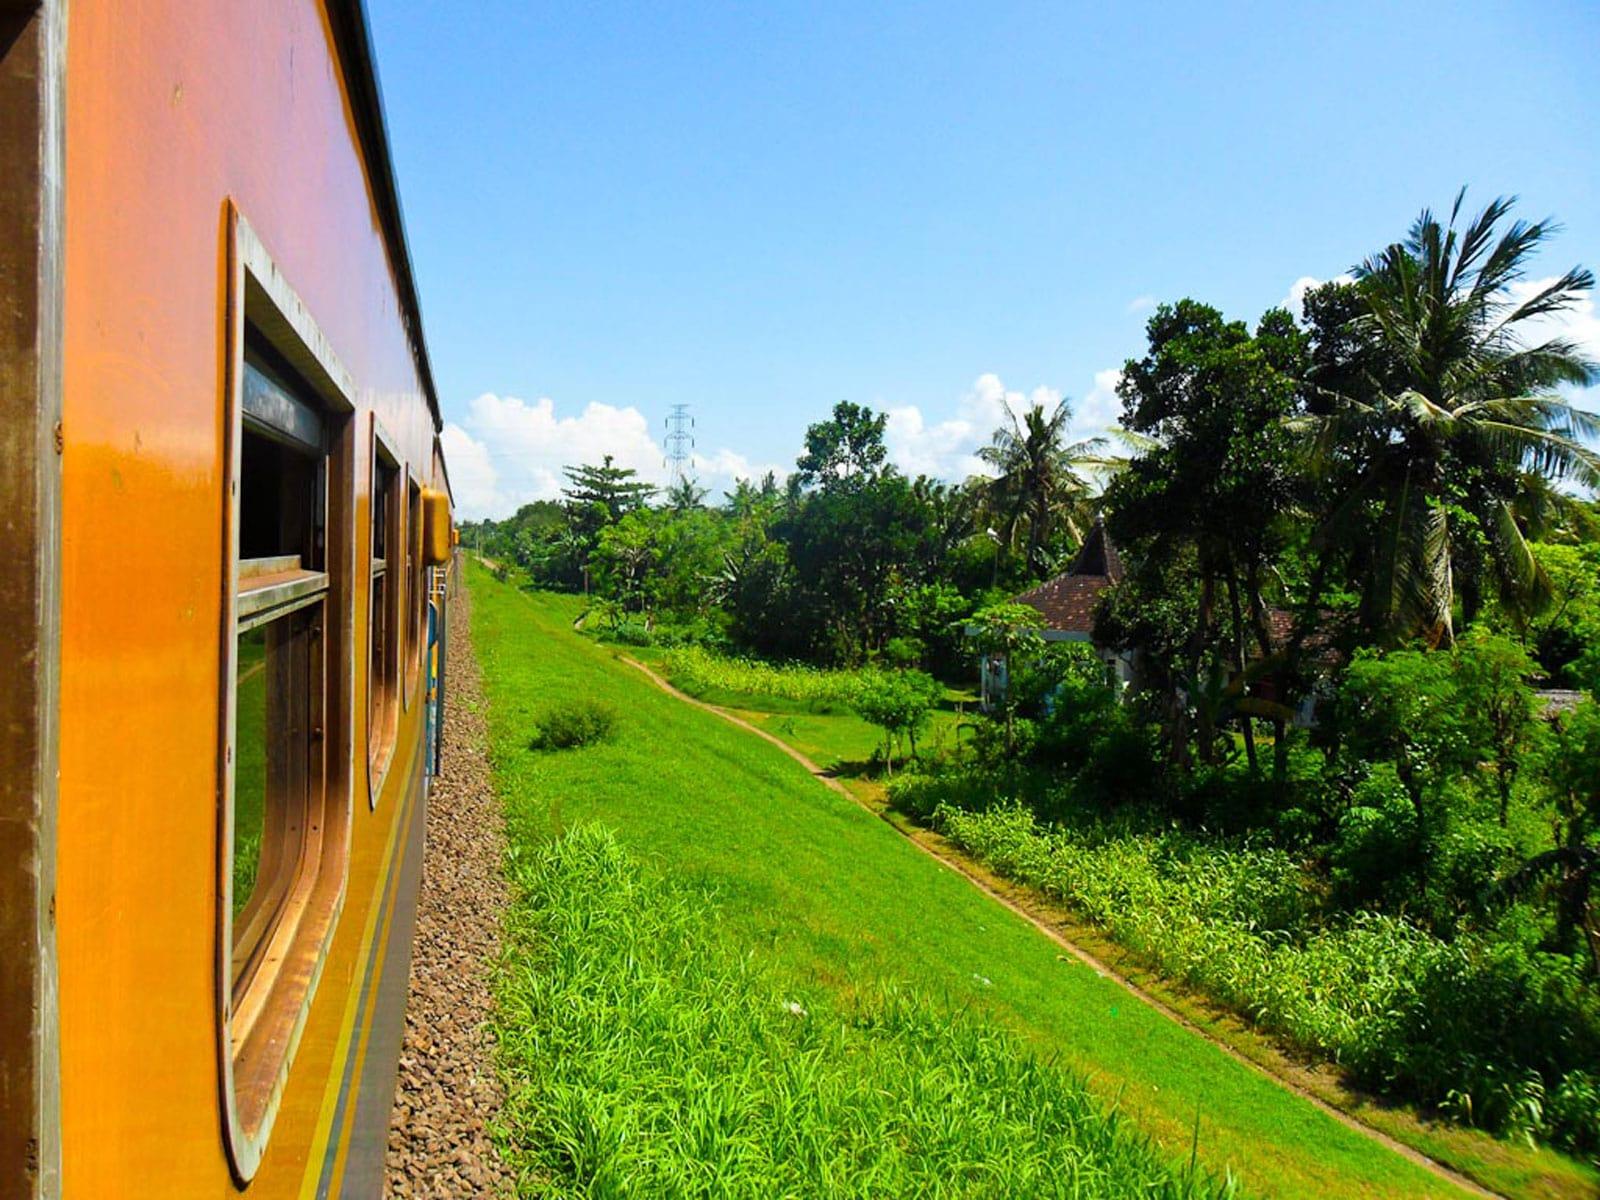 rondreis java treinreizen hoogtepunt 1